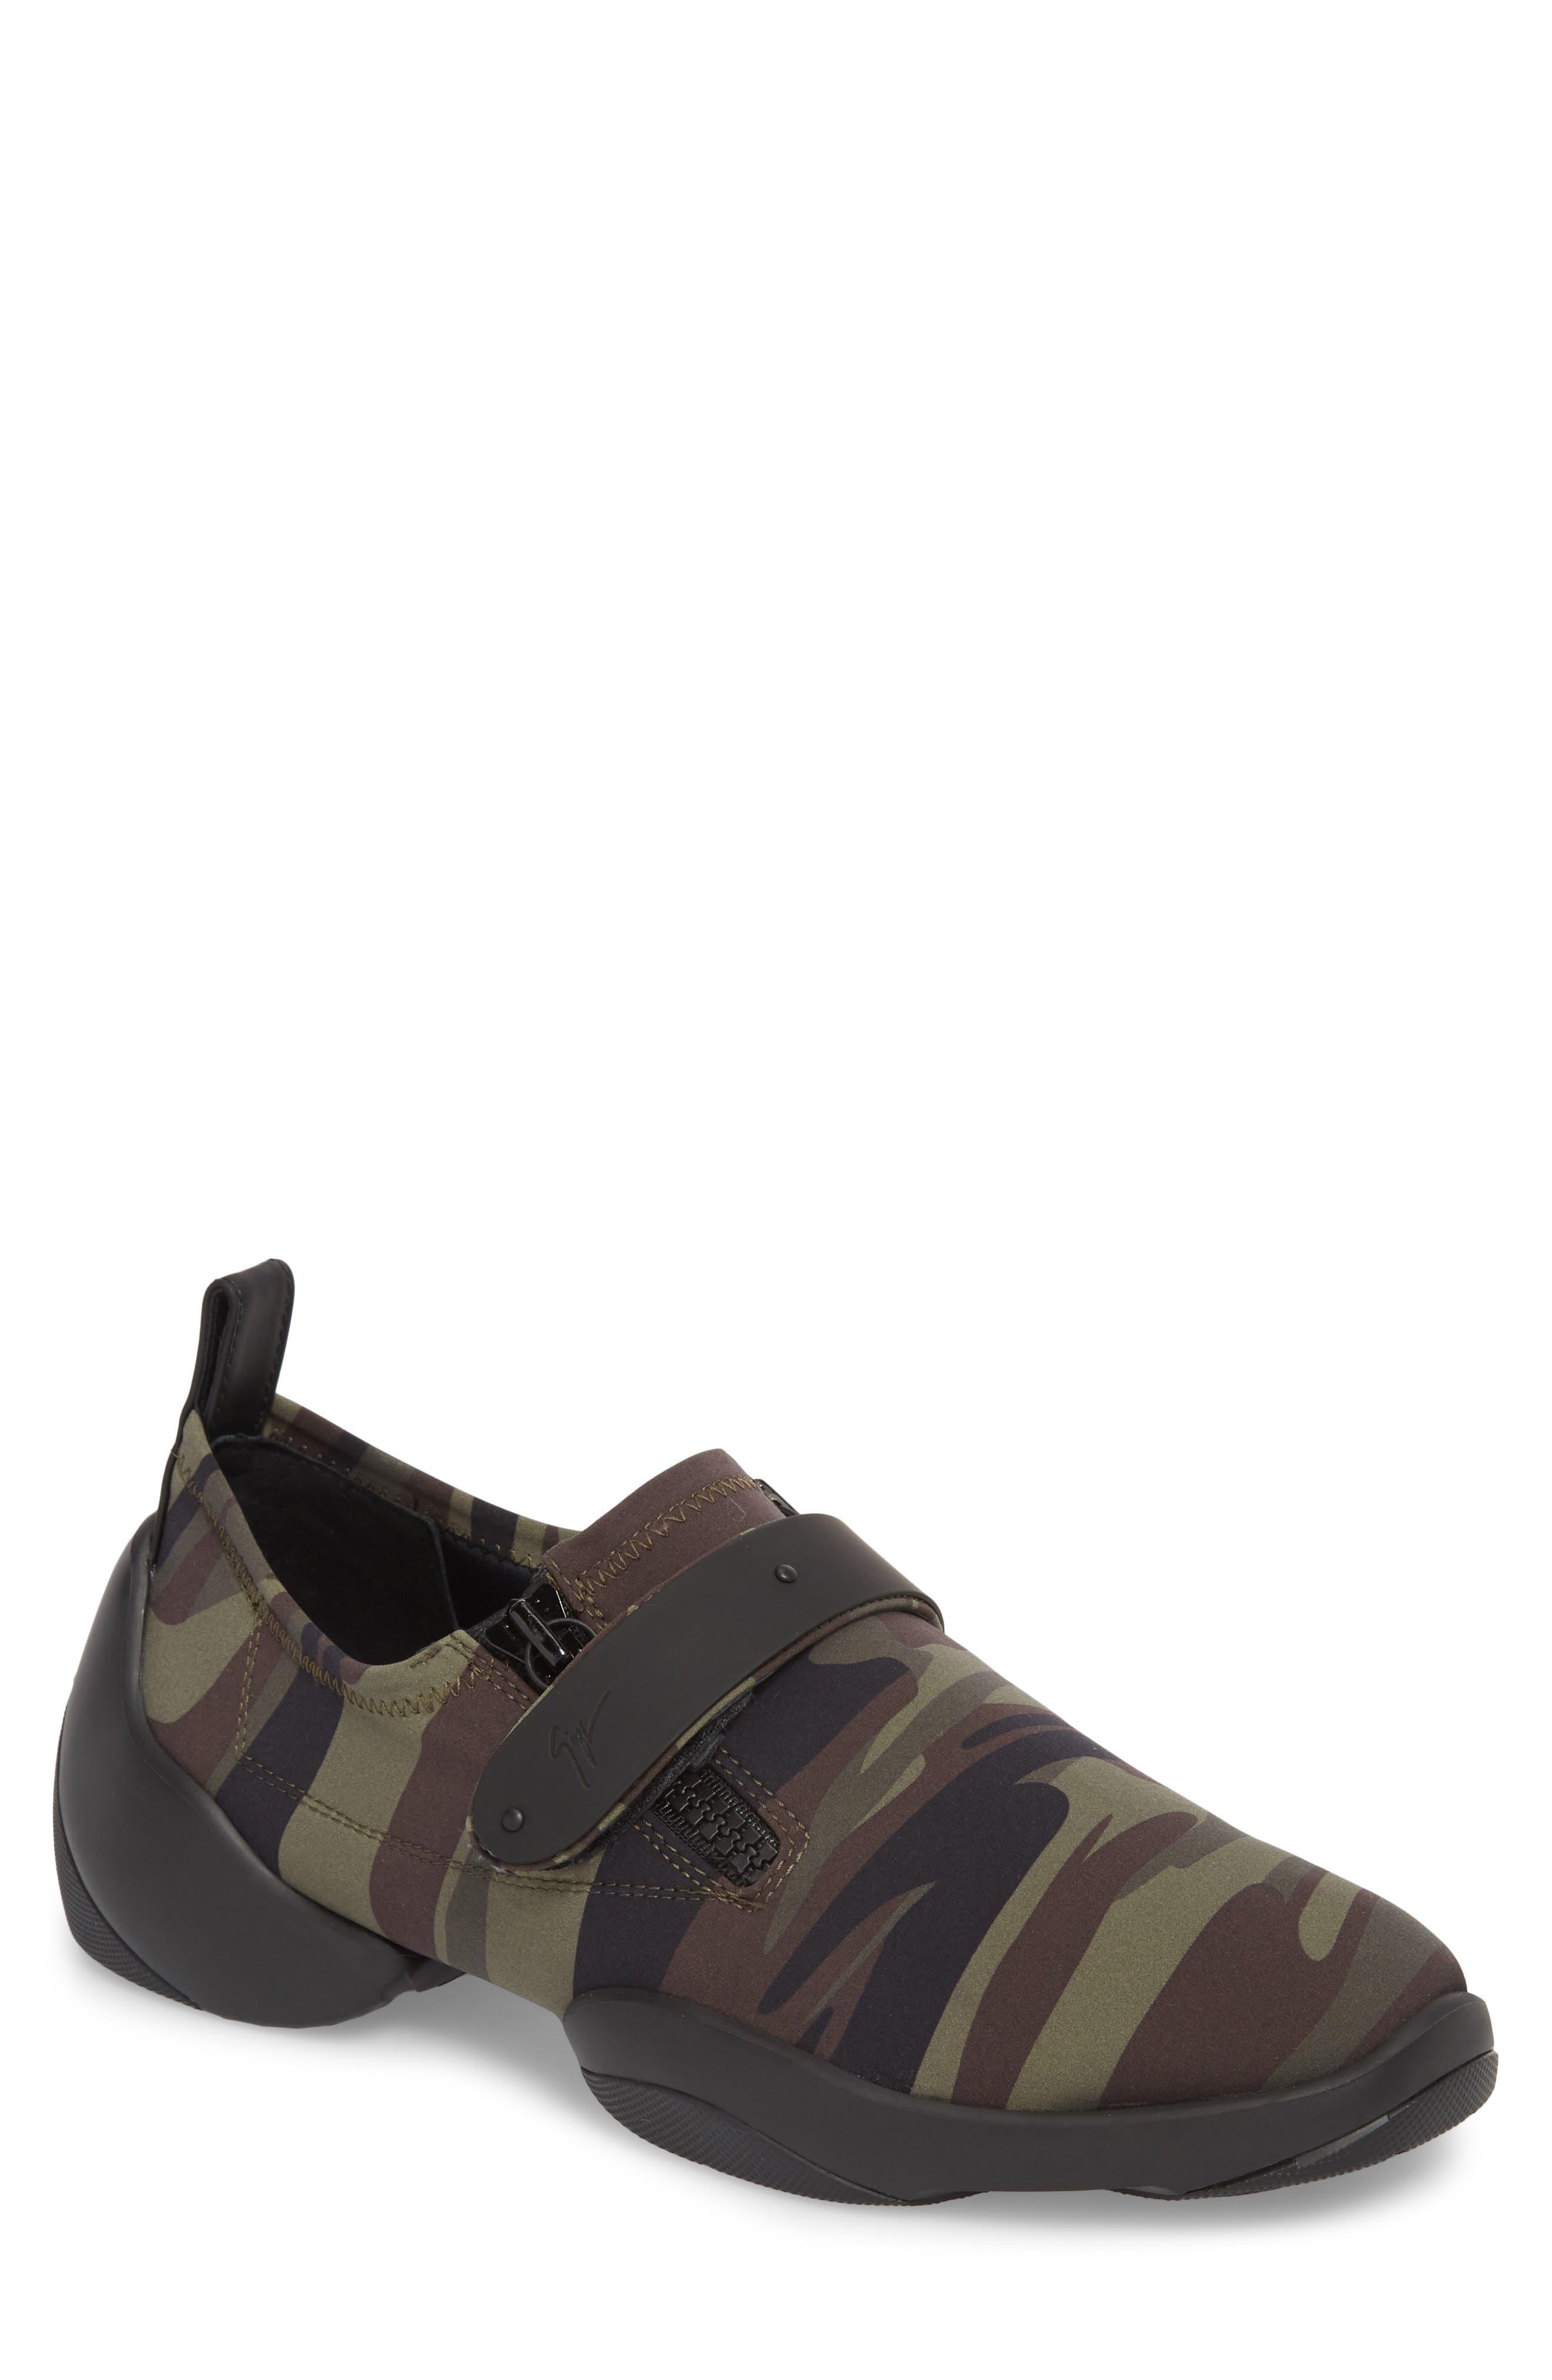 Scuba Strap Sneaker,                             Main thumbnail 1, color,                             Military Neoprene